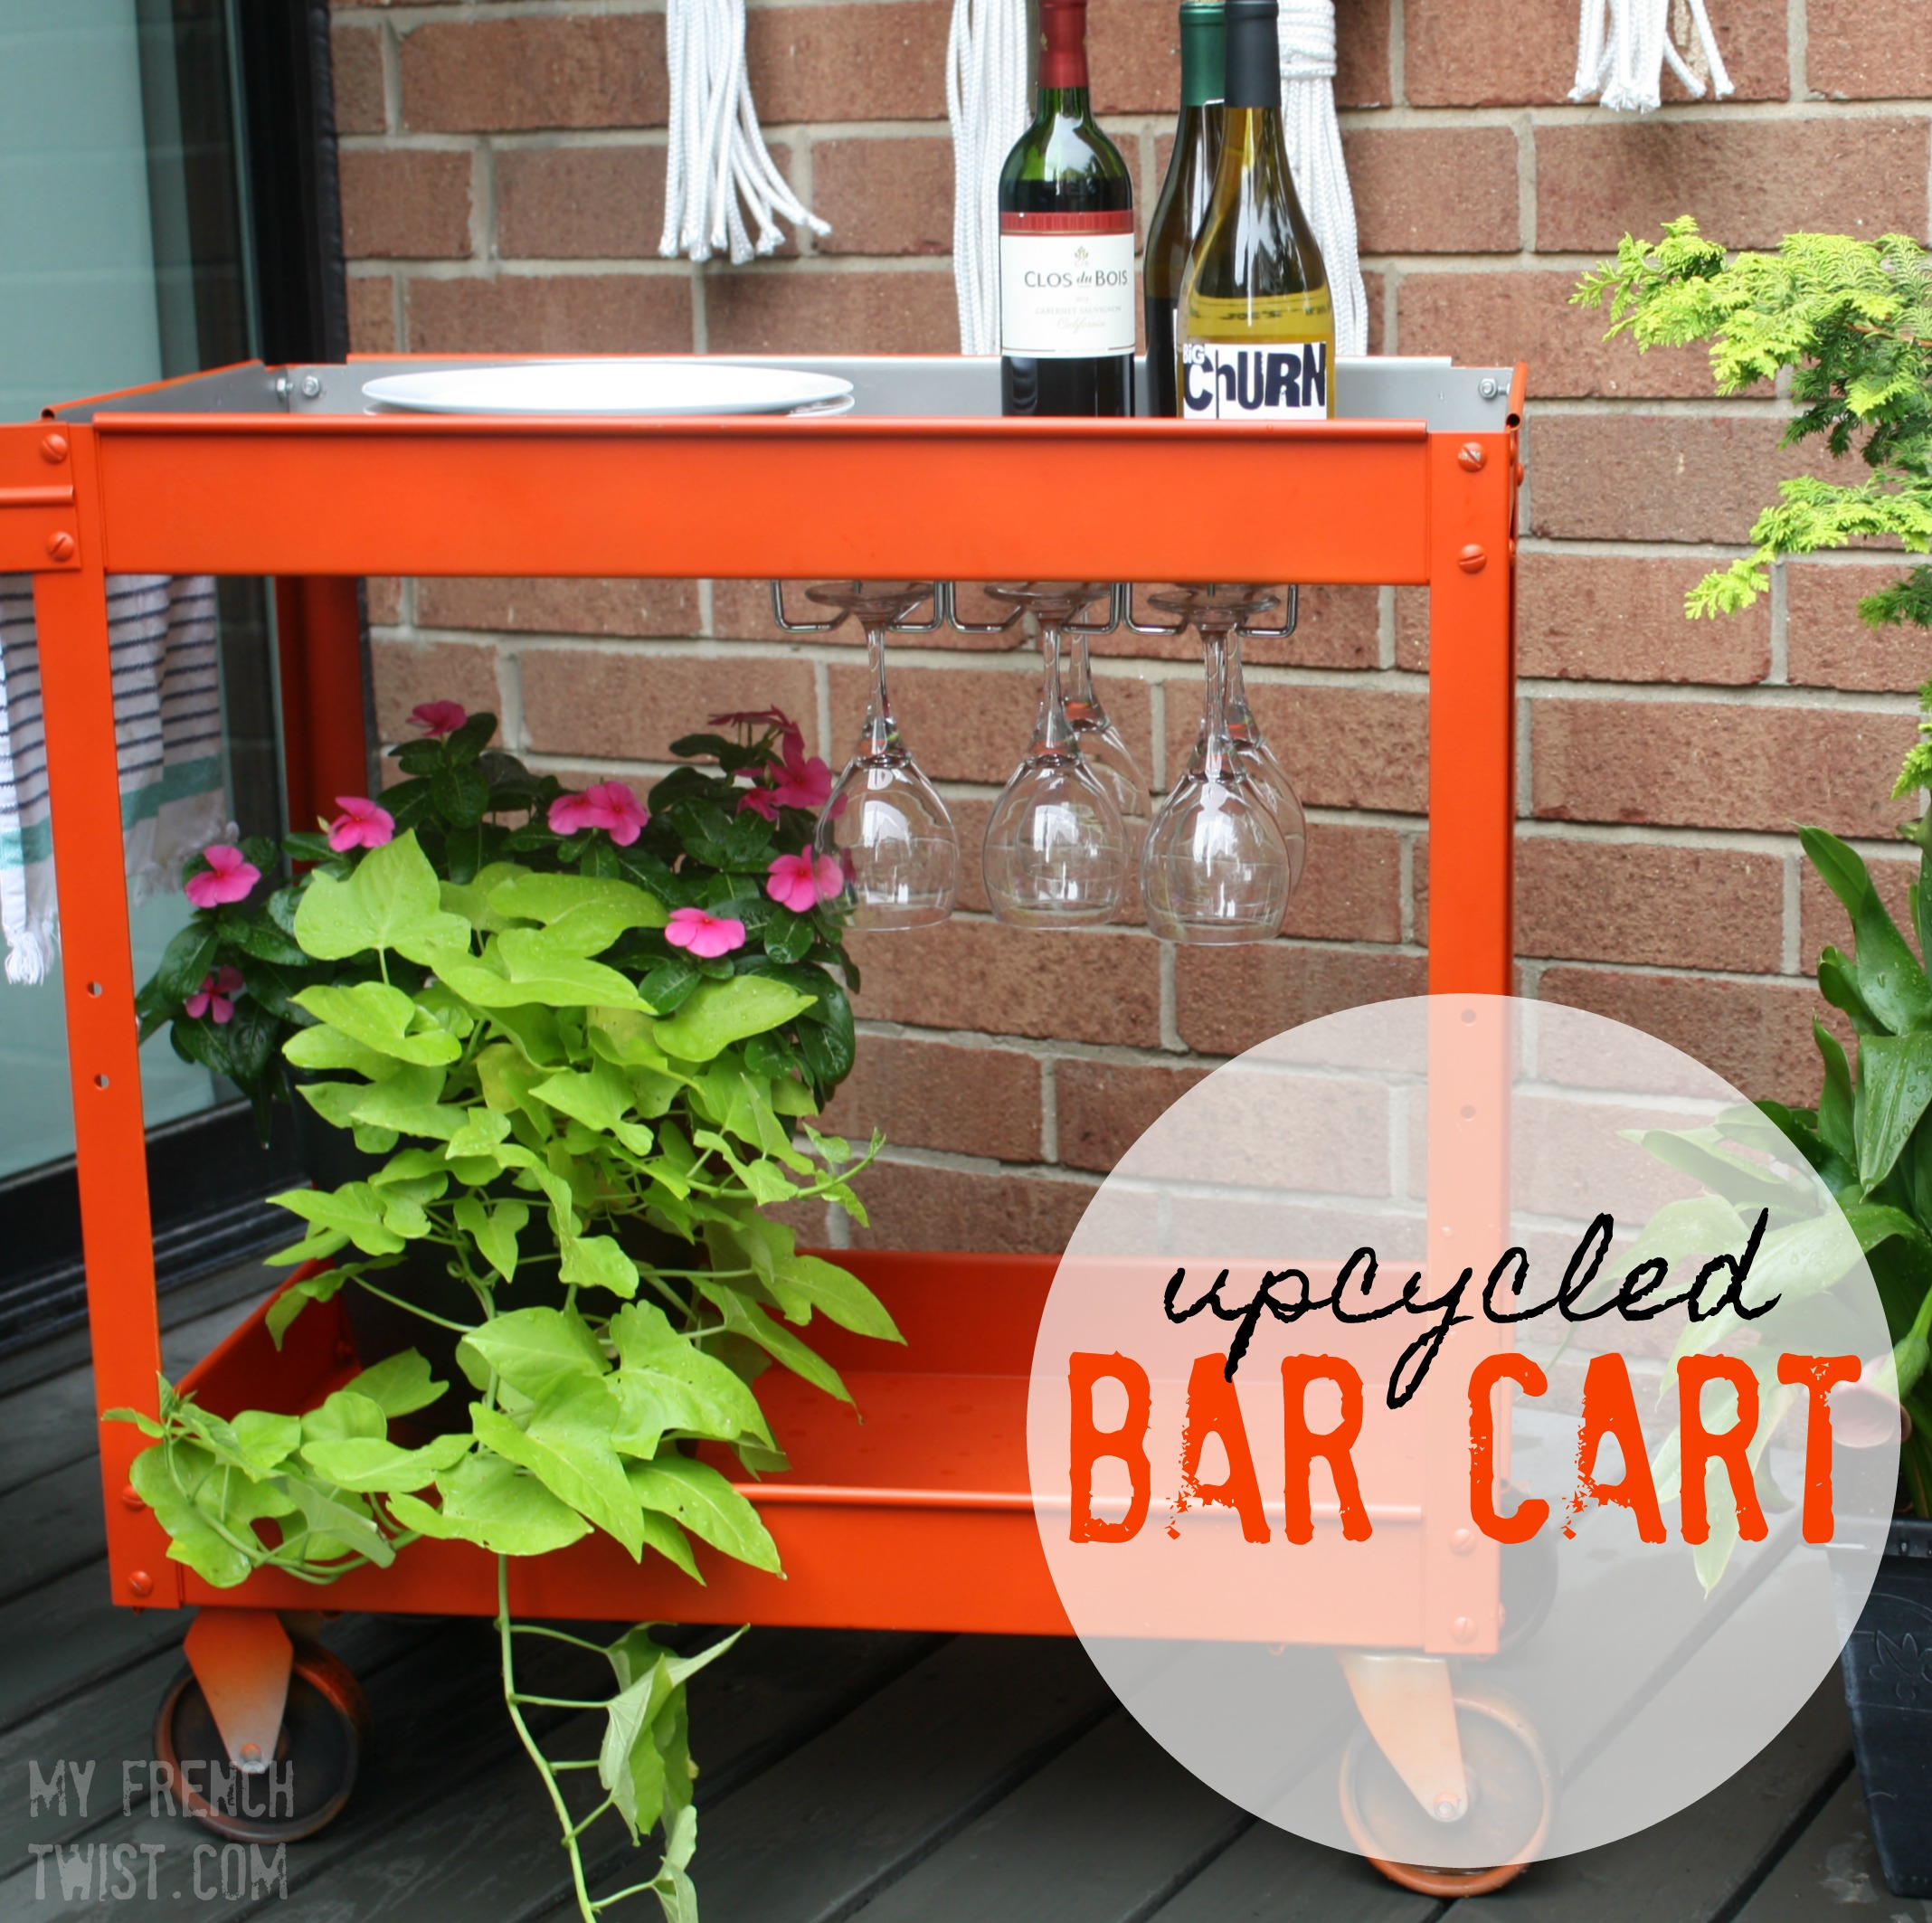 upcycled bar cart - myfrenchtwist.com